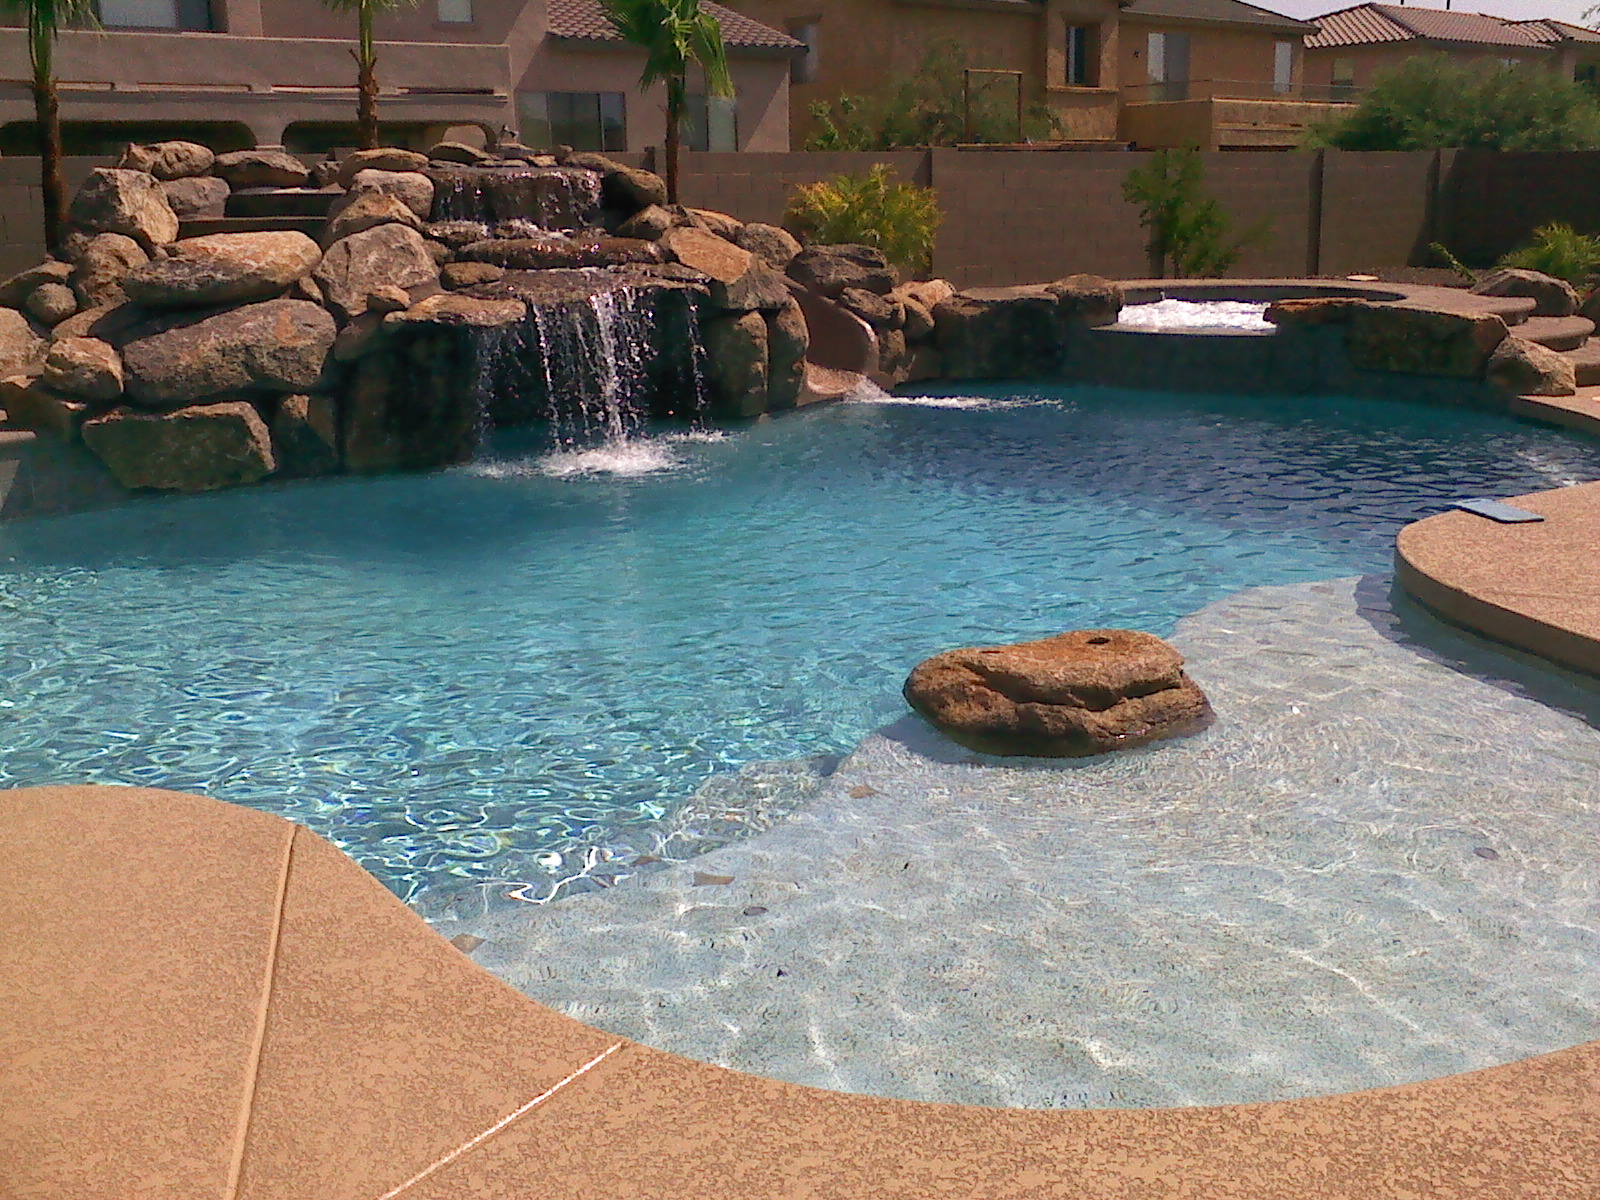 Cabana Boys Pool Service Surprise Az 85387 Angies List